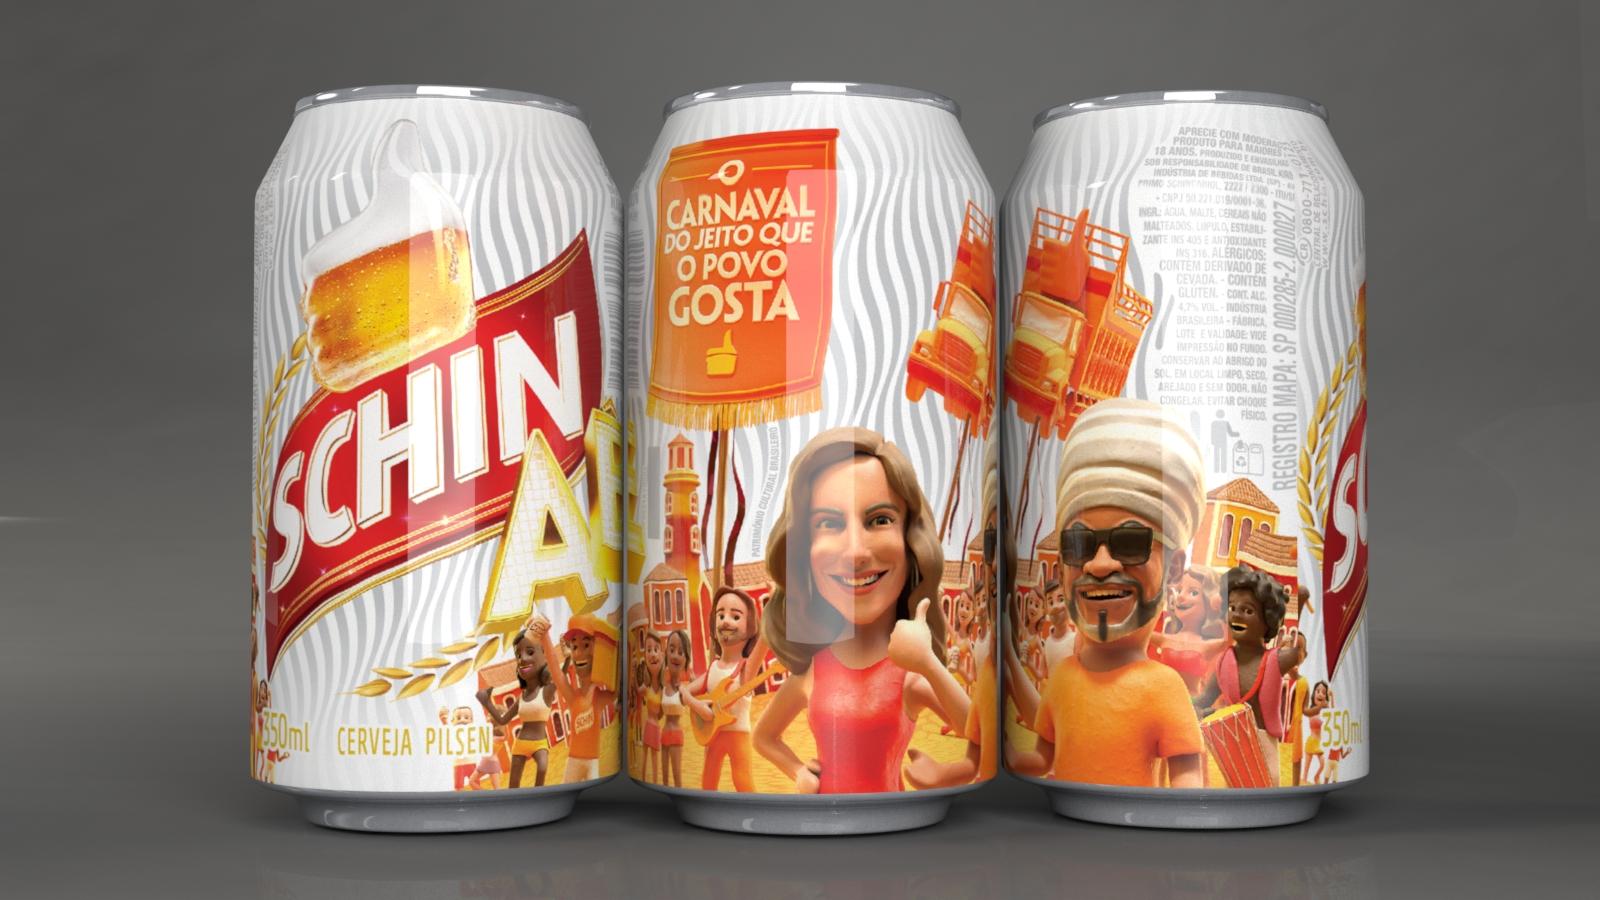 Venda exclusiva de bebidas da Brasil Kirin nas praias é ilegal, diz TCE